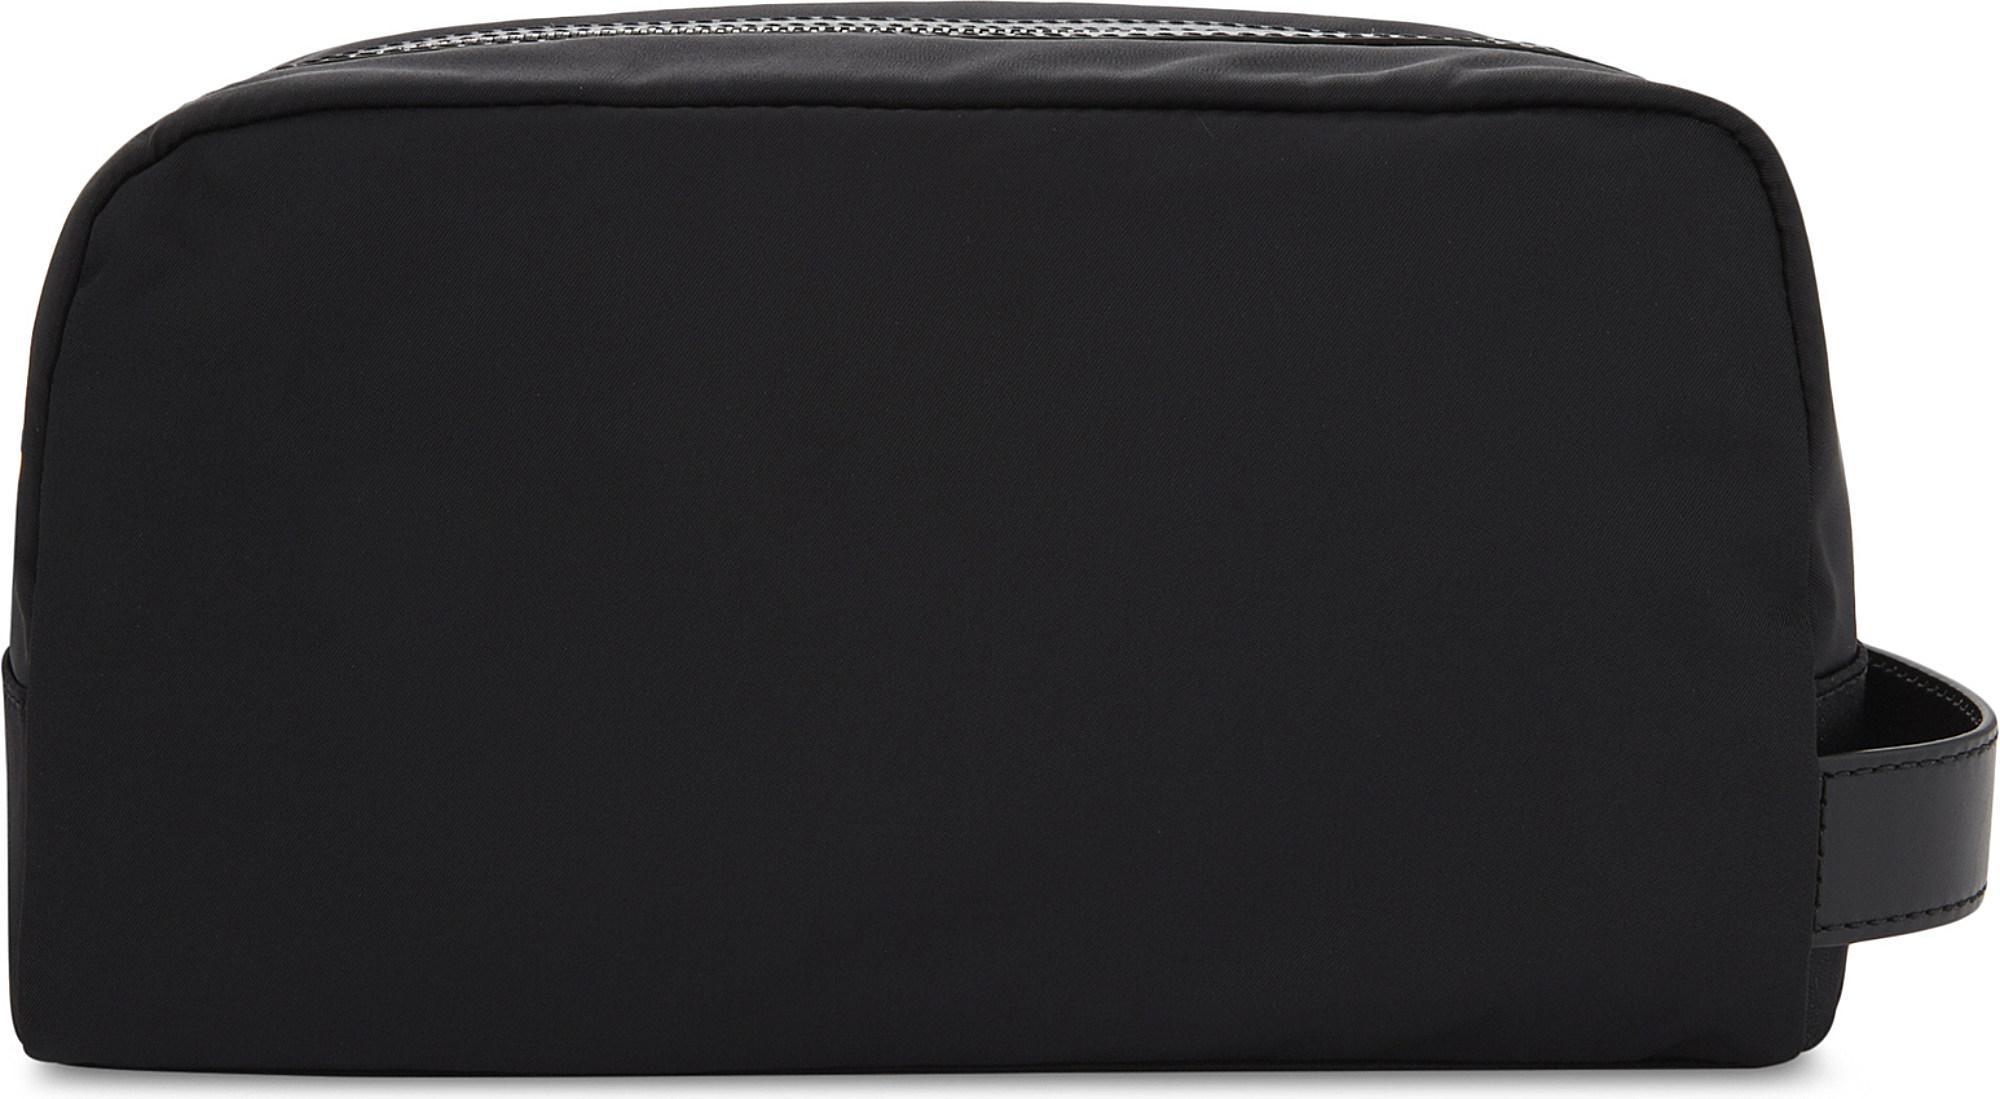 635987ab9201 Lyst - Michael Kors Mens Black Functional Modern Kent Washbag in ...